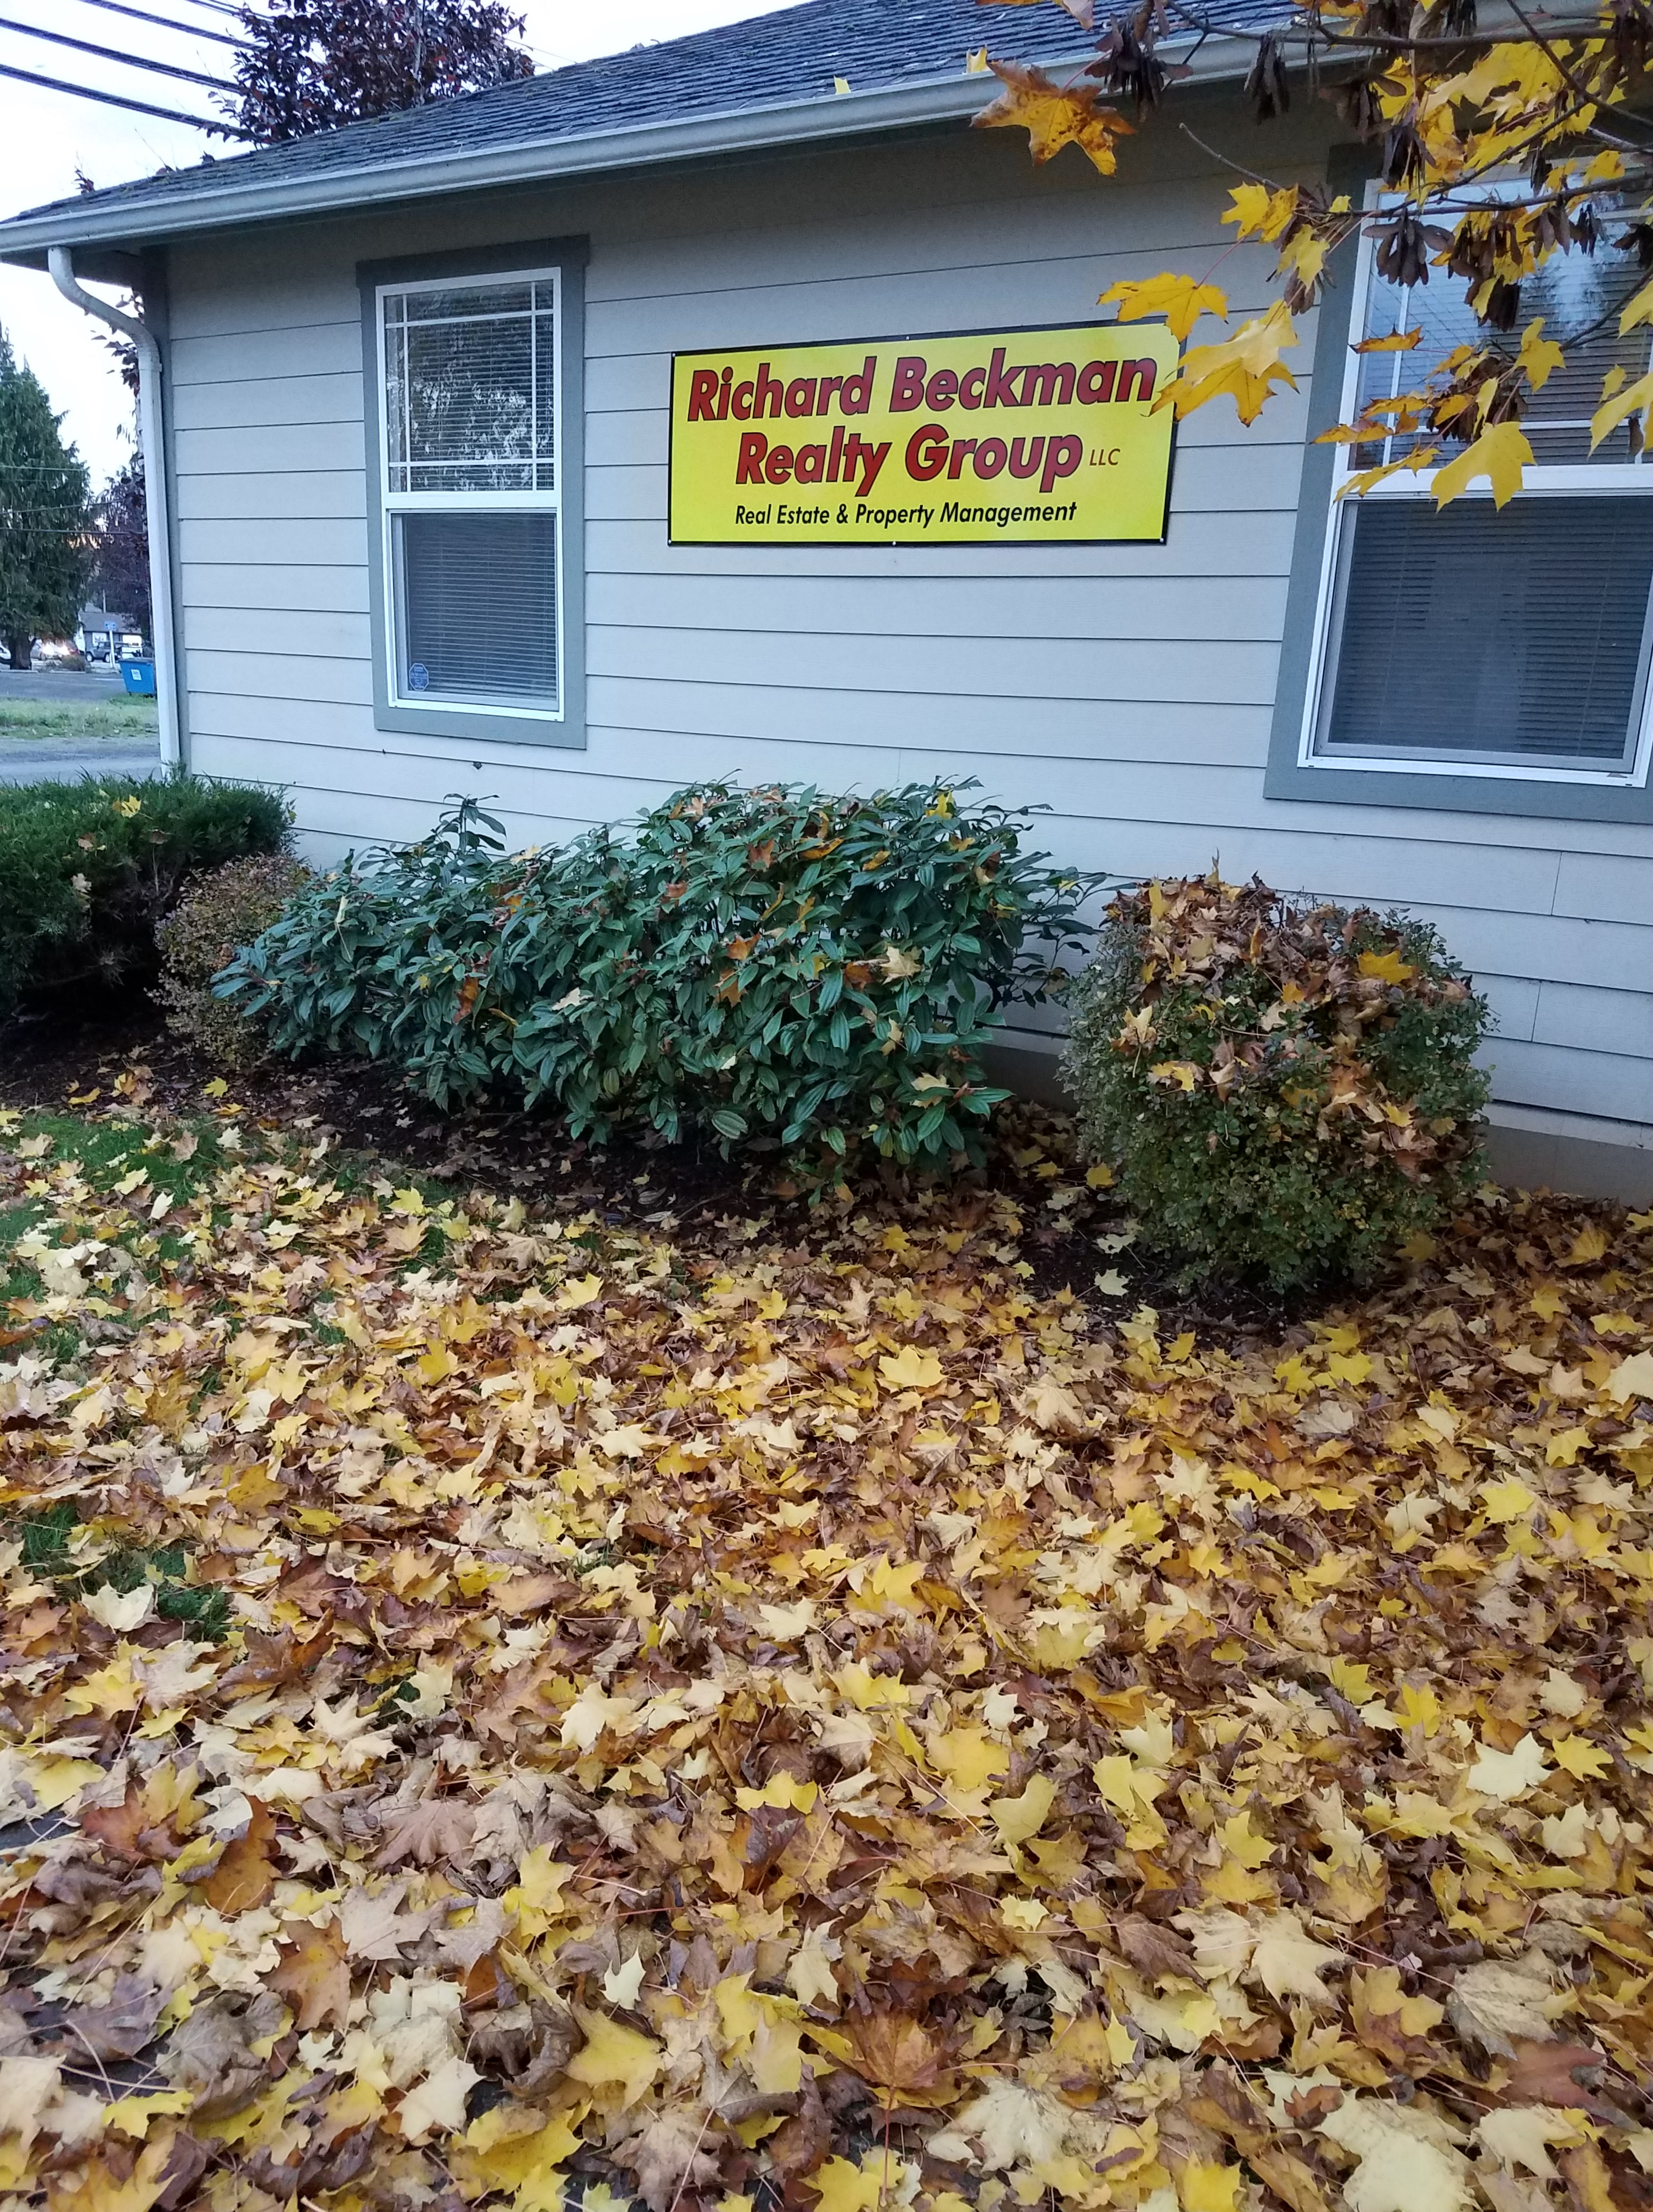 Fall Day at the Richard Beckman Realty Group, LLC